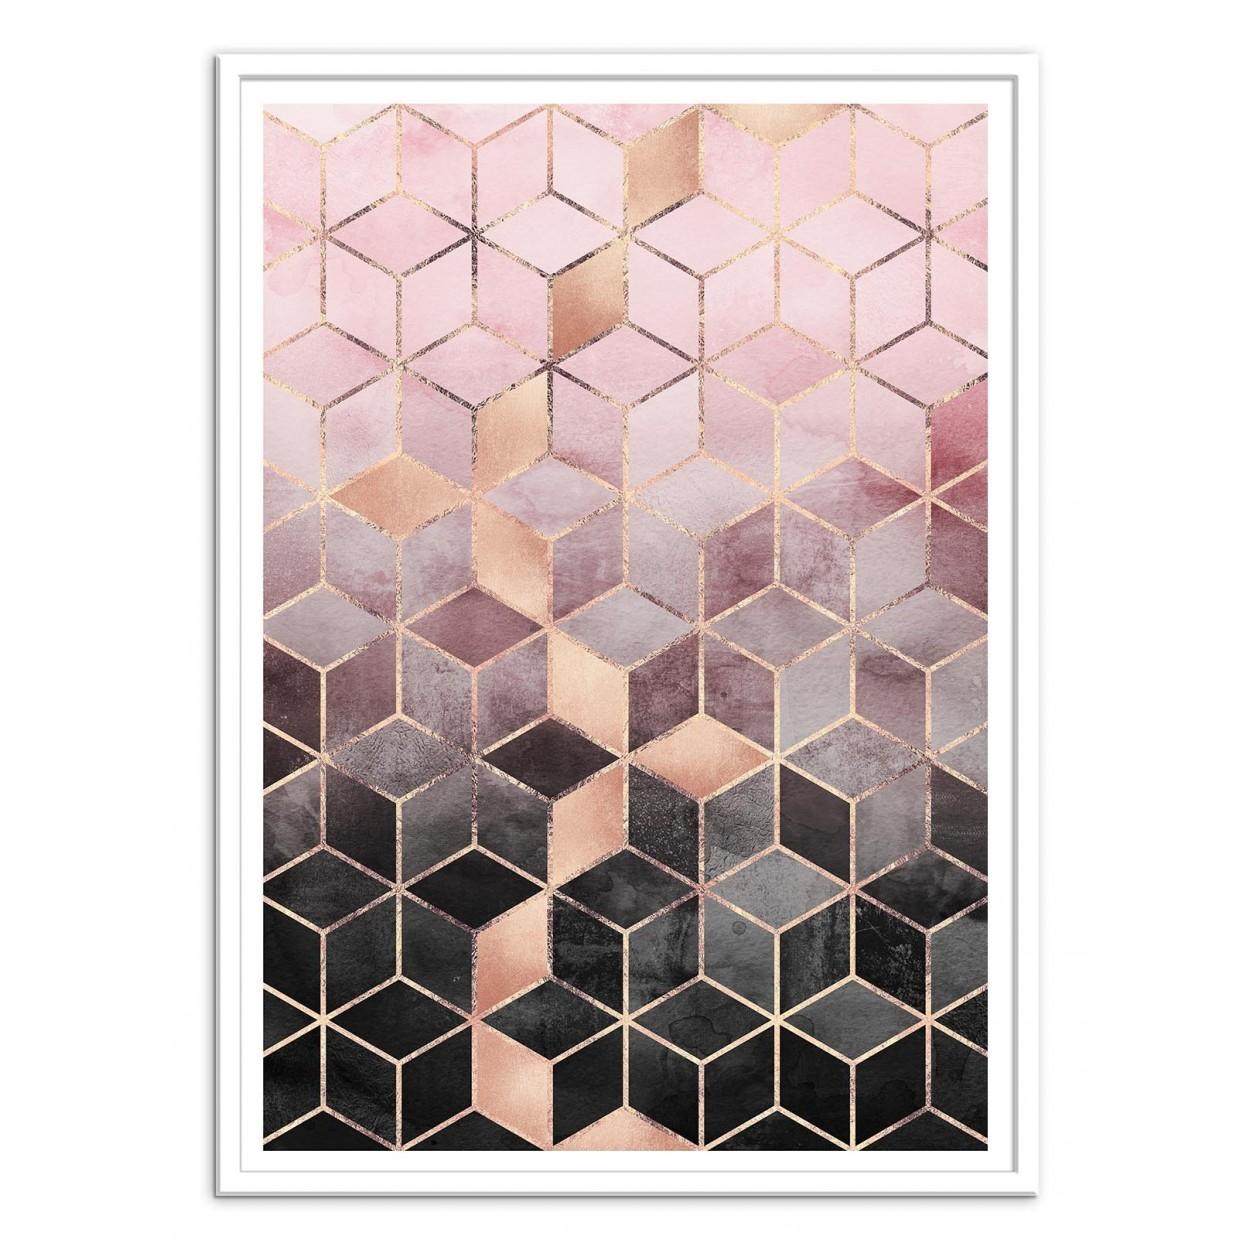 Poster design 50x70 -  Art Poster 50 X 70 Cm Pink Grey Gradient Cubes Elisabeth Fredriksson